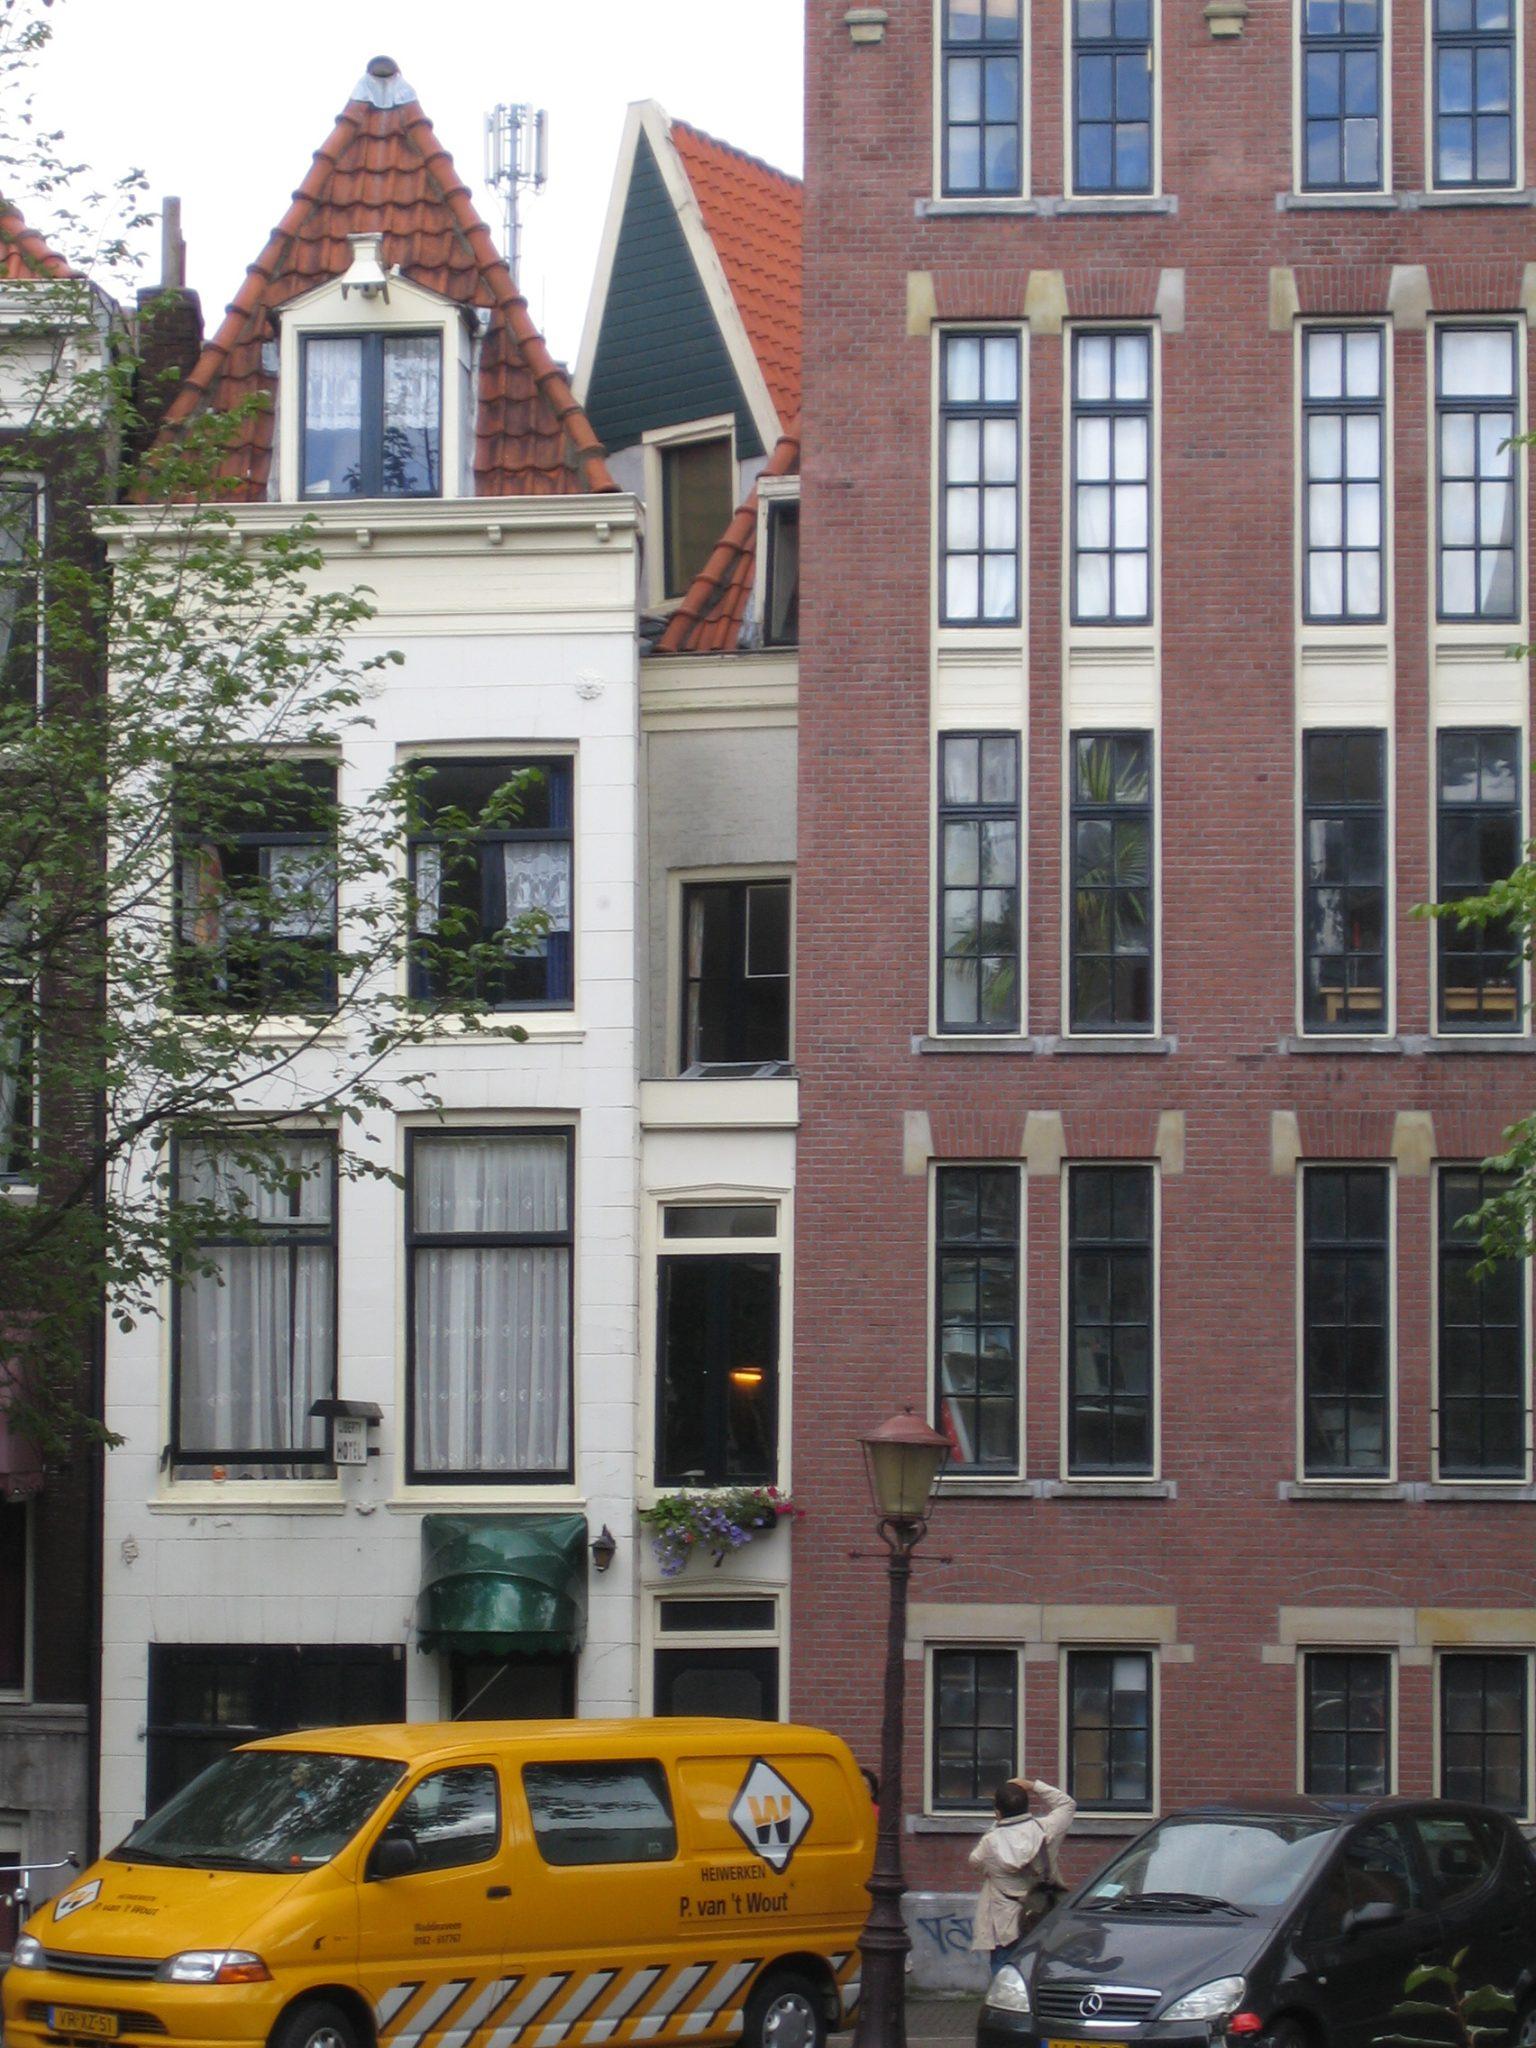 A Very Thin House